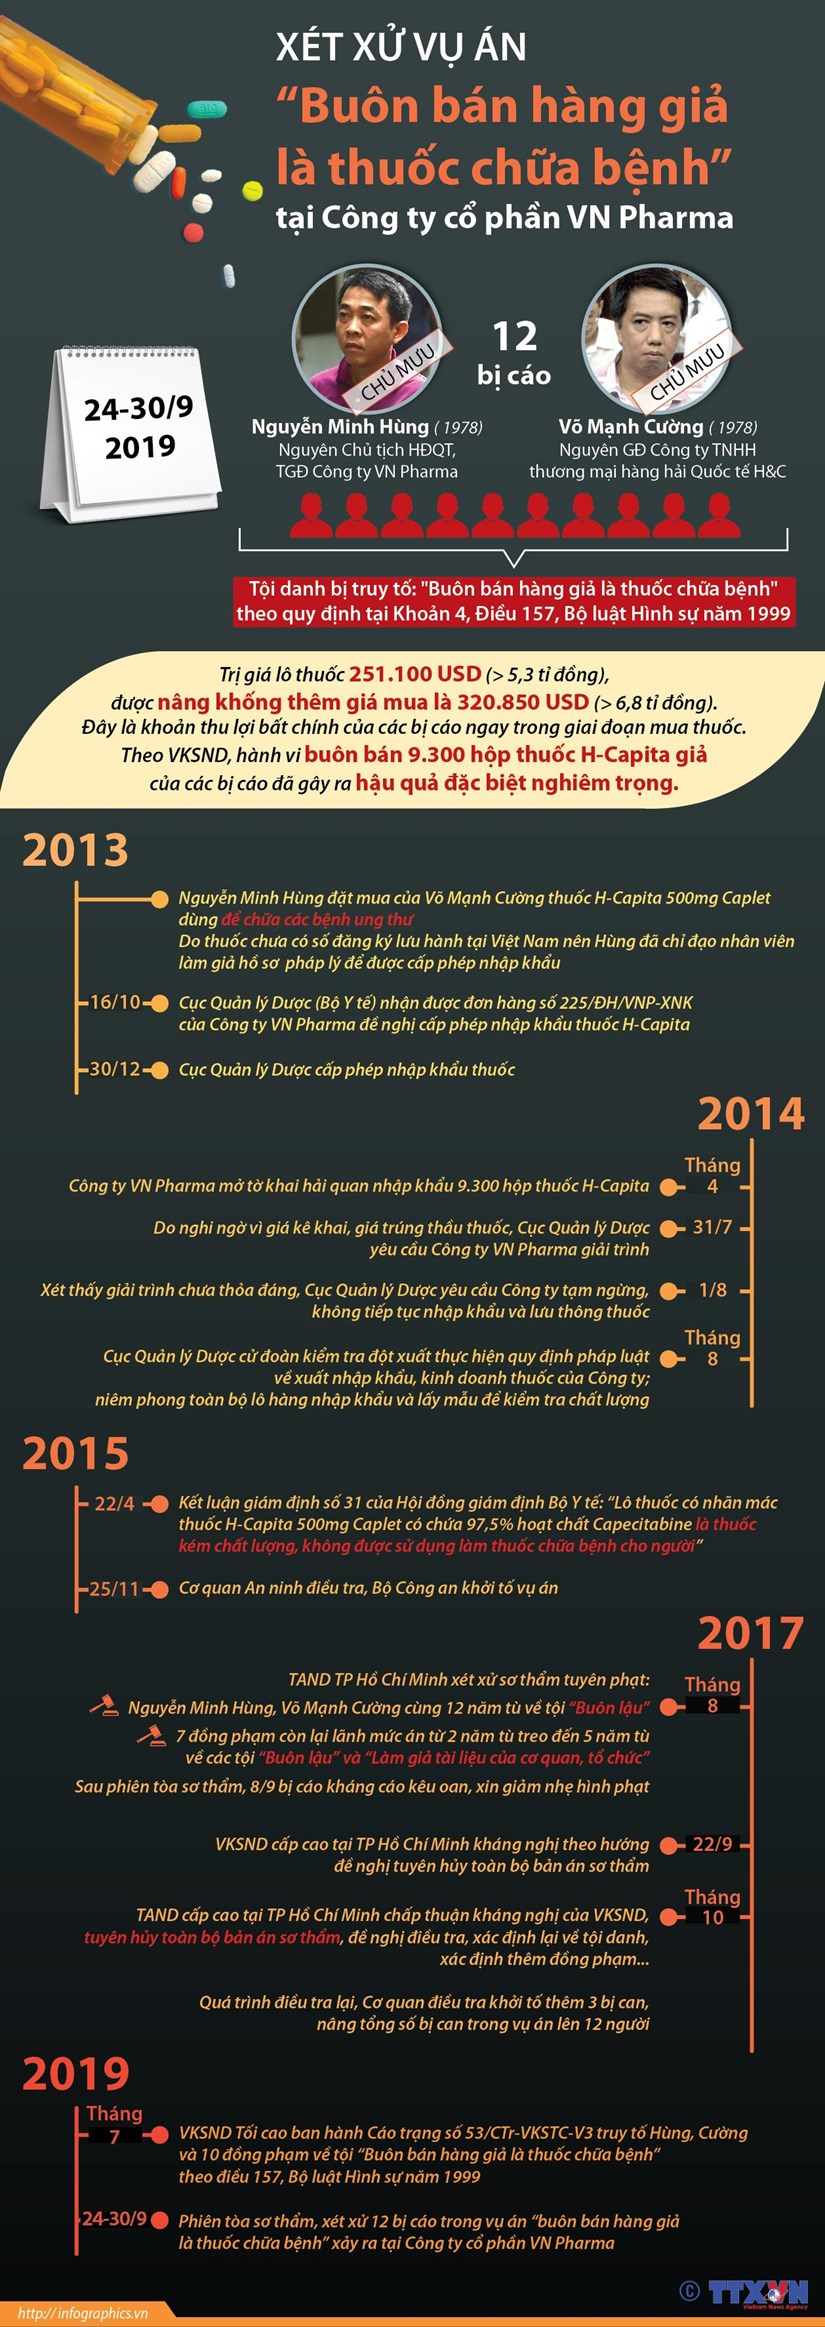 [Infographics] Xet xu vu an ban thuoc chua ung thu gia tai VN Pharma hinh anh 1